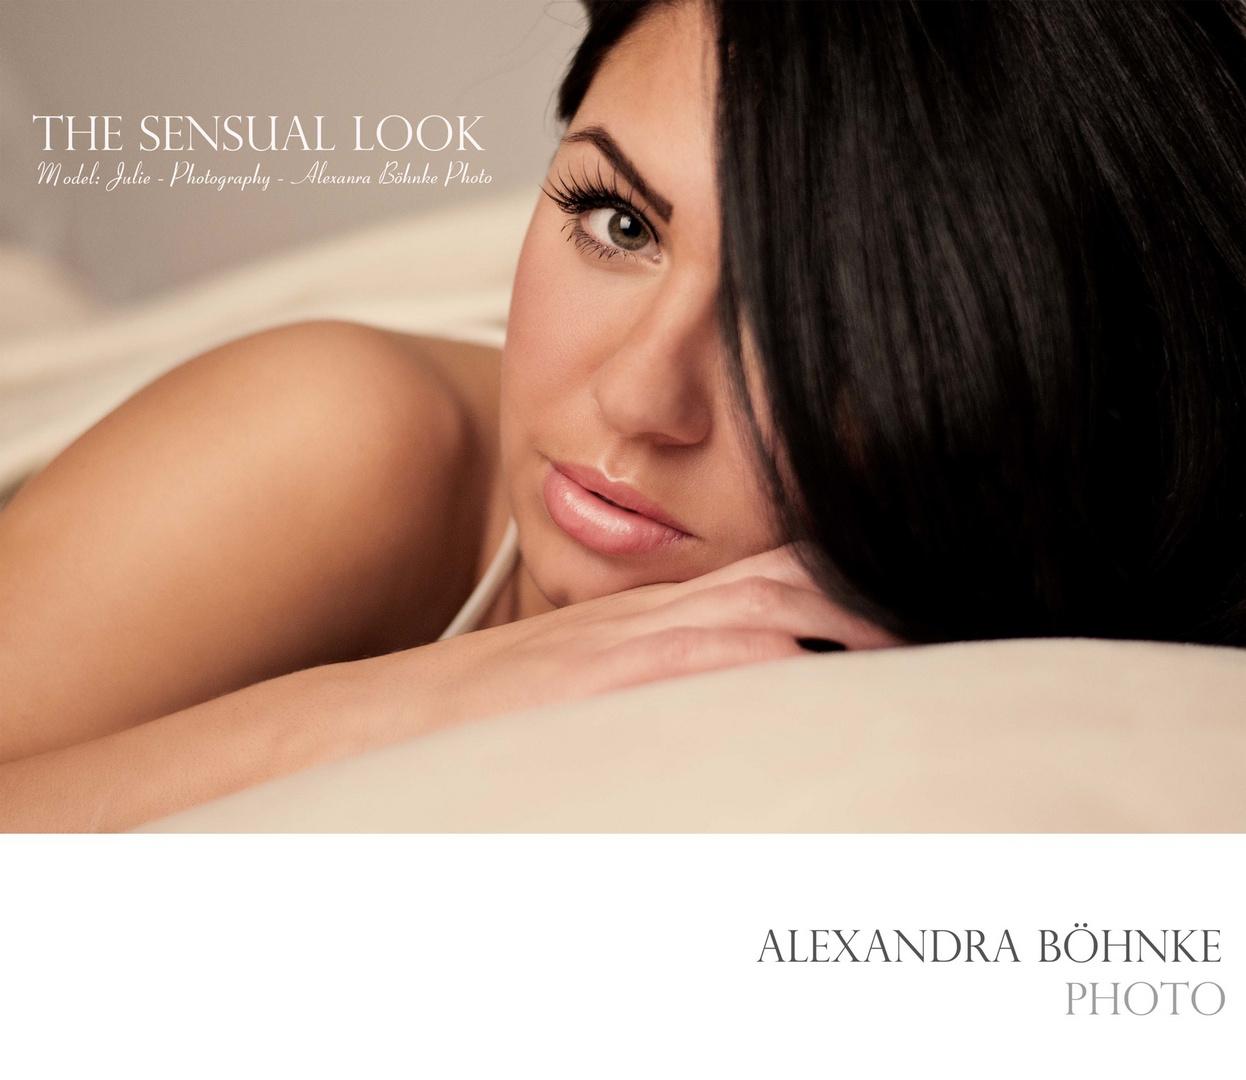 www.alexandraboehnkephoto.com